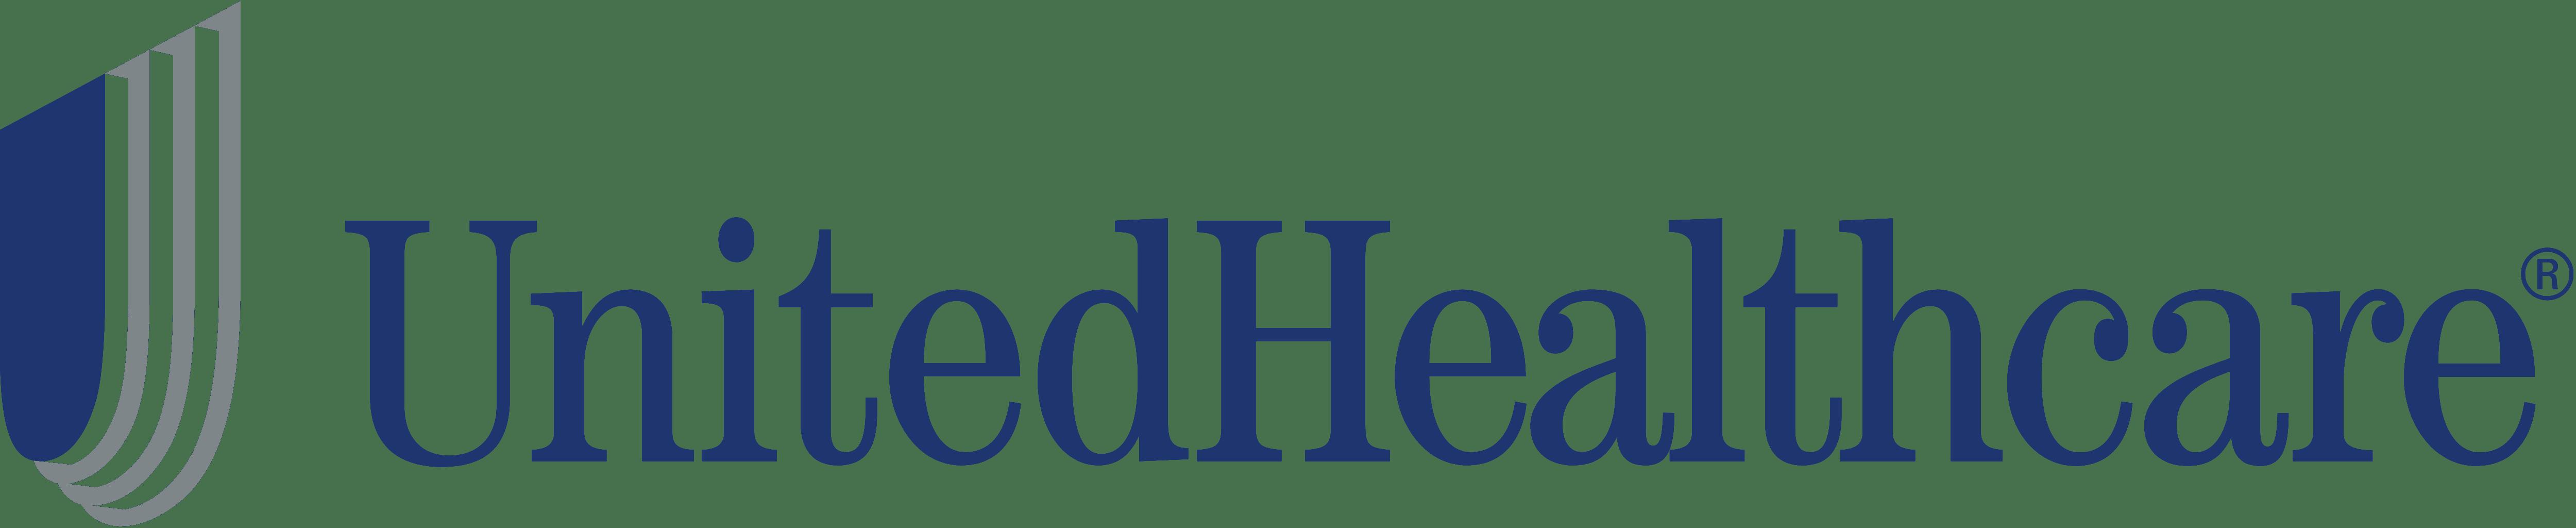 https://physiownc.com/wp-content/uploads/Unitedhealthcare_logo_r.png